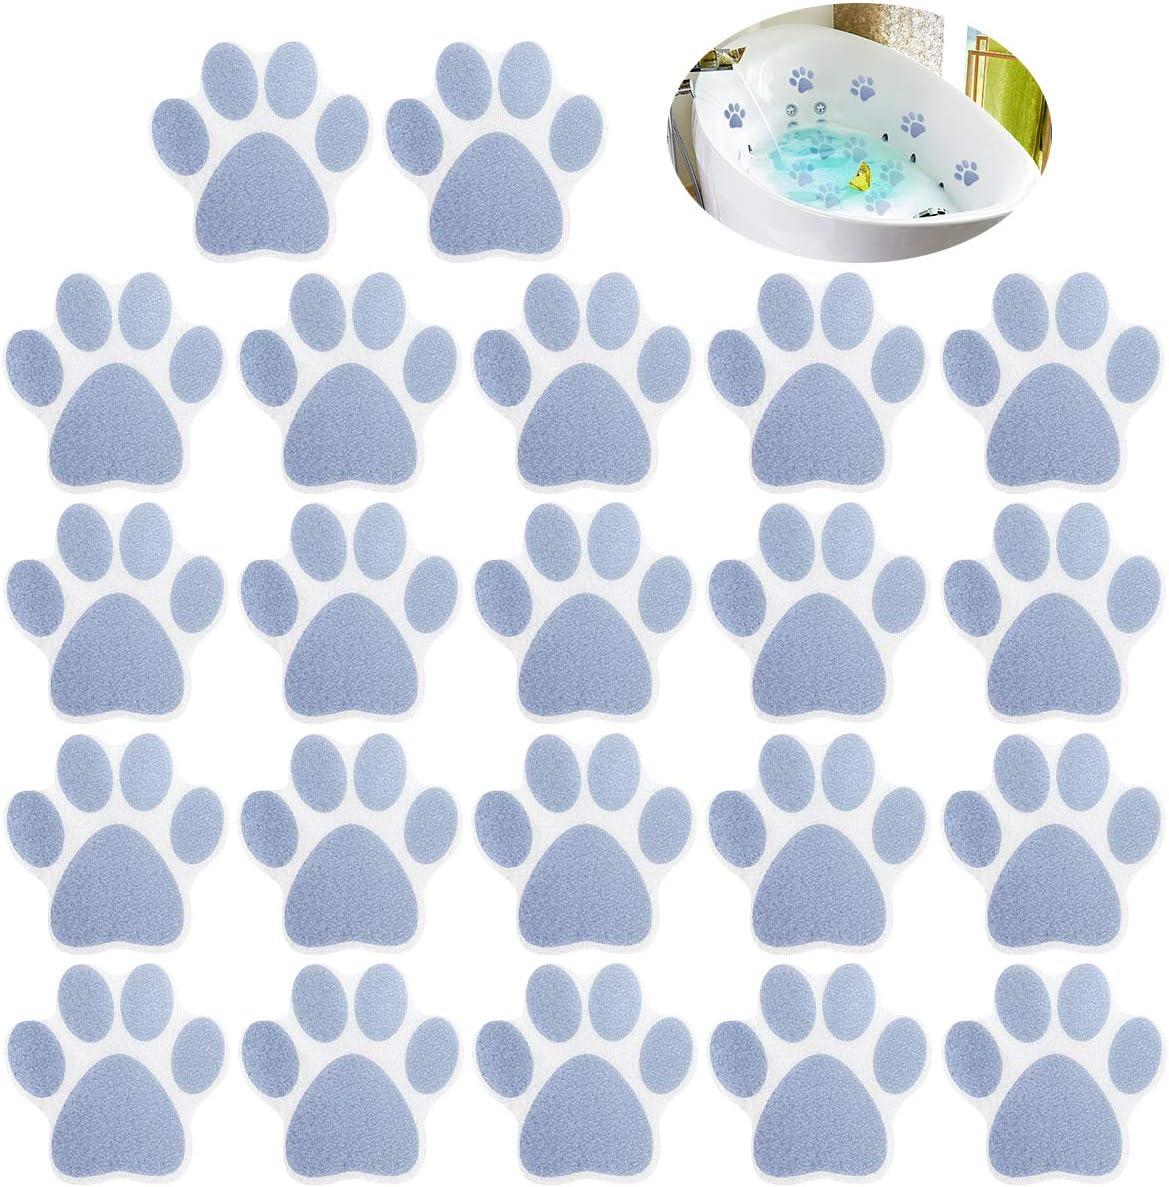 22 Pieces Non-slip Bathtub Stickers Bath Trea OFFicial site Adhesive Gifts Print Paw